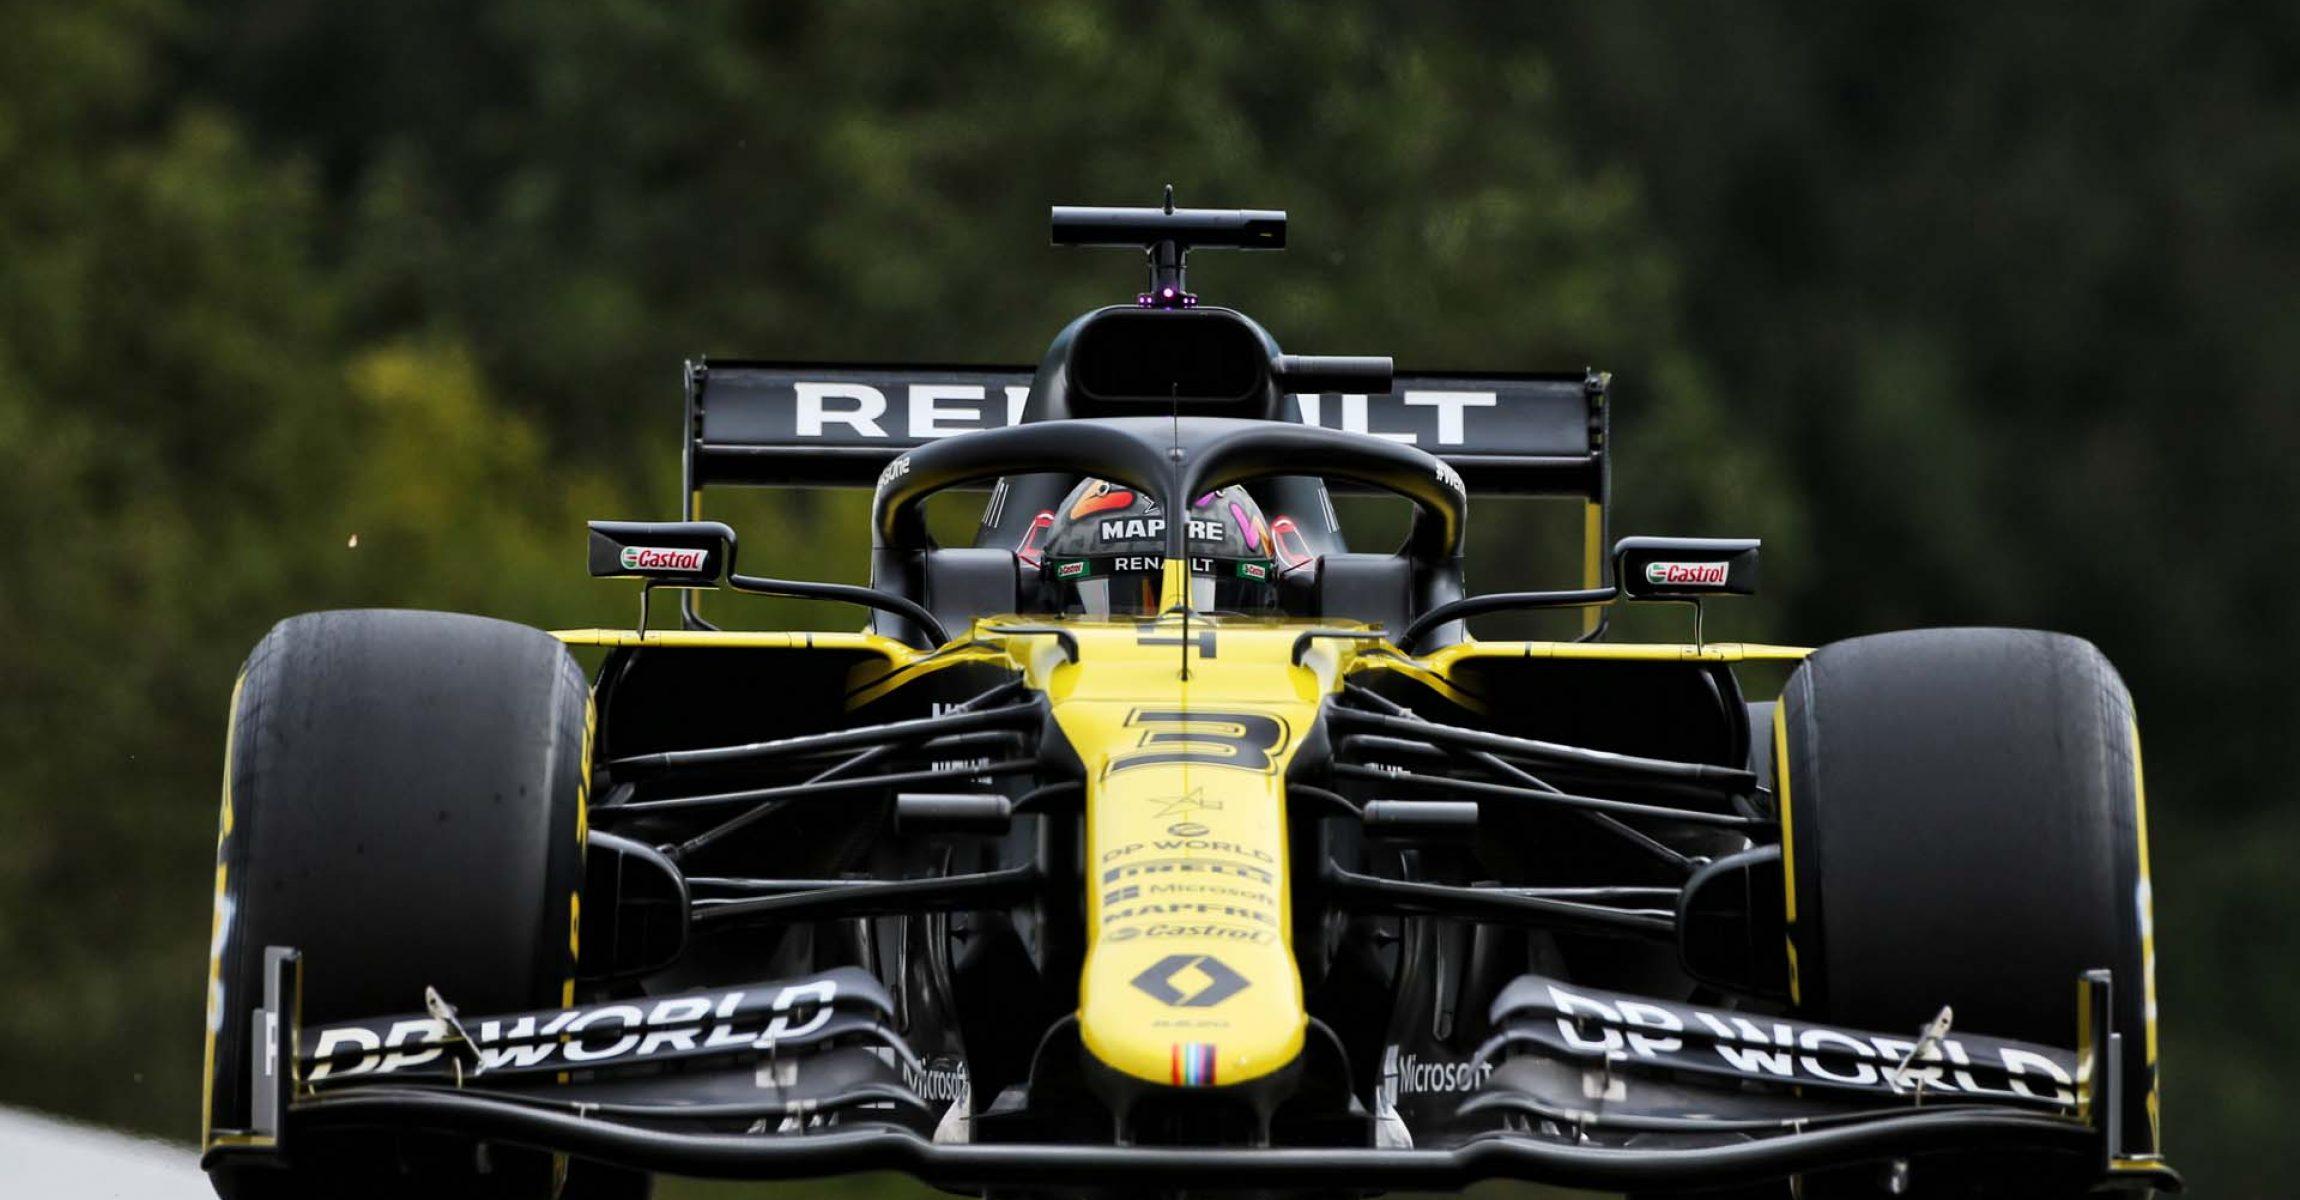 Daniel Ricciardo (AUS) Renault F1 Team RS20. Belgian Grand Prix, Friday 28th August 2020. Spa-Francorchamps, Belgium.